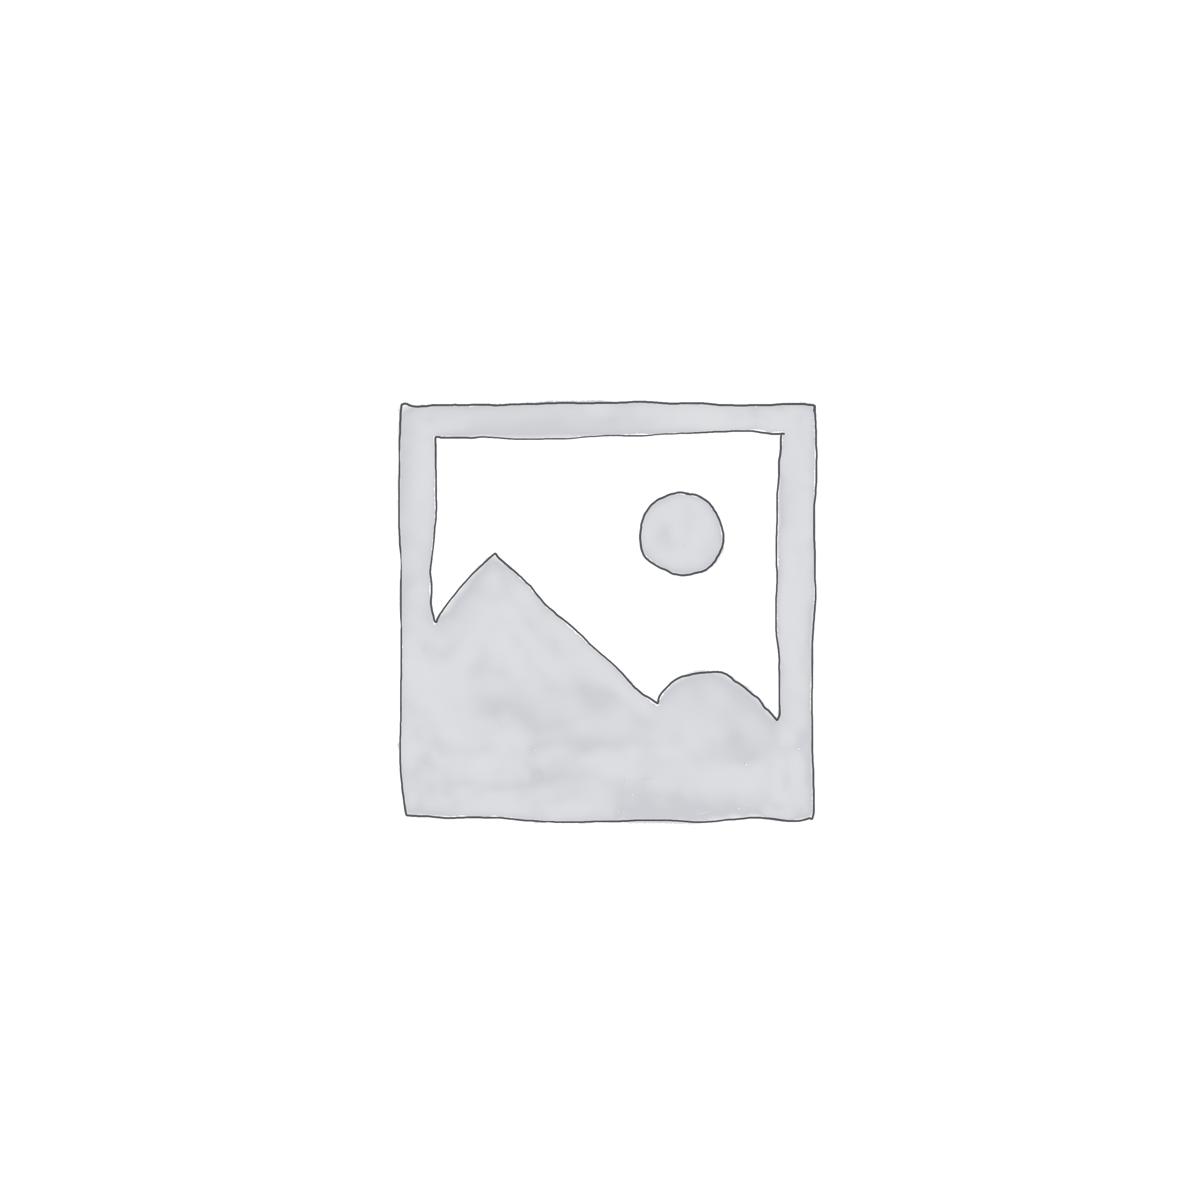 Cream Swarovski Daisy Floral Wallpaper Mural